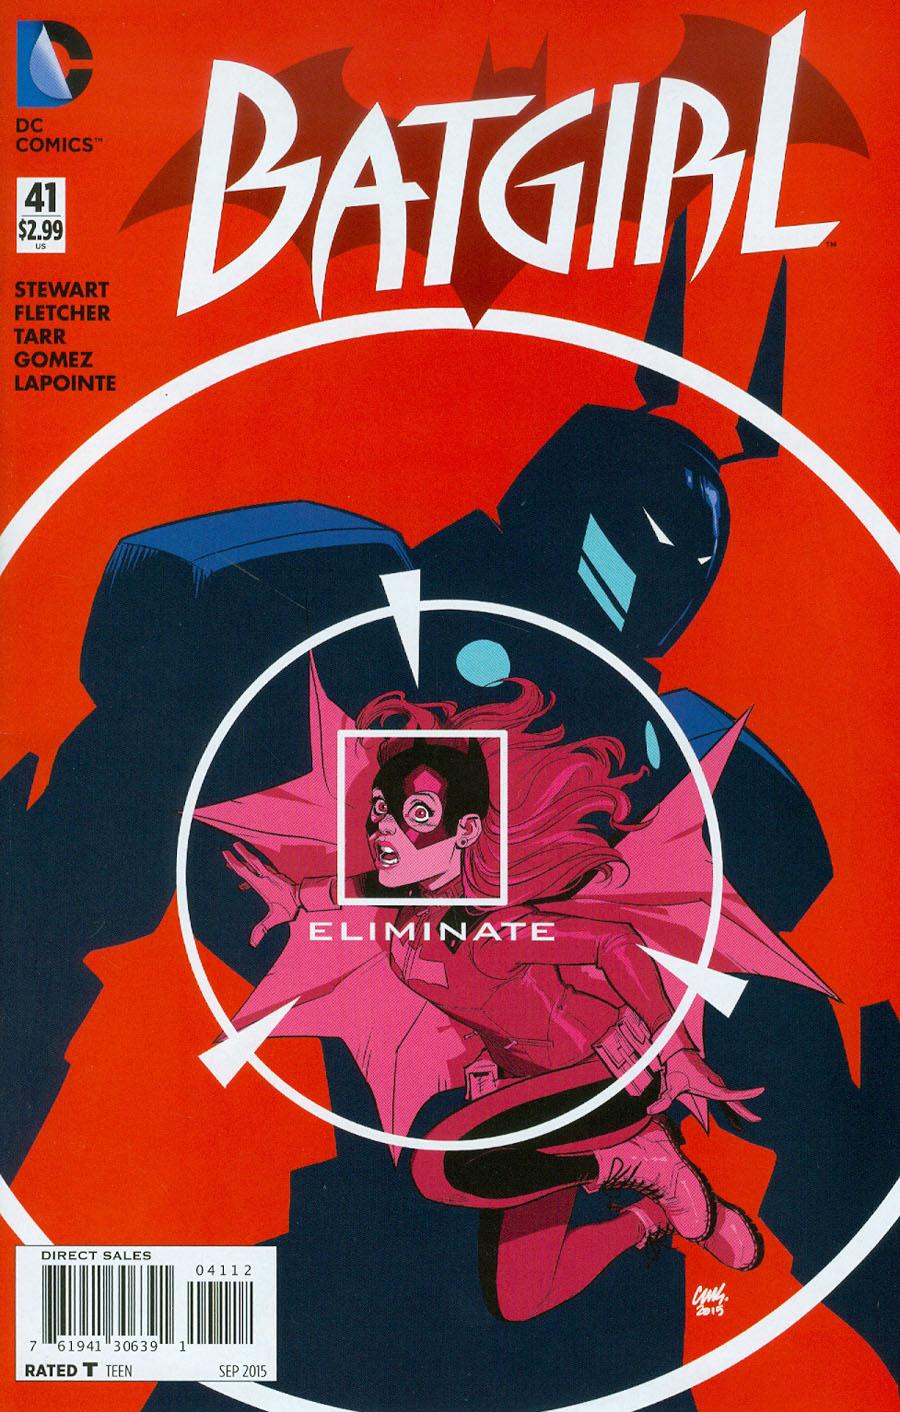 Batgirl Vol 4 #41 Cover B 2nd Ptg Cameron Stewart Variant Cover